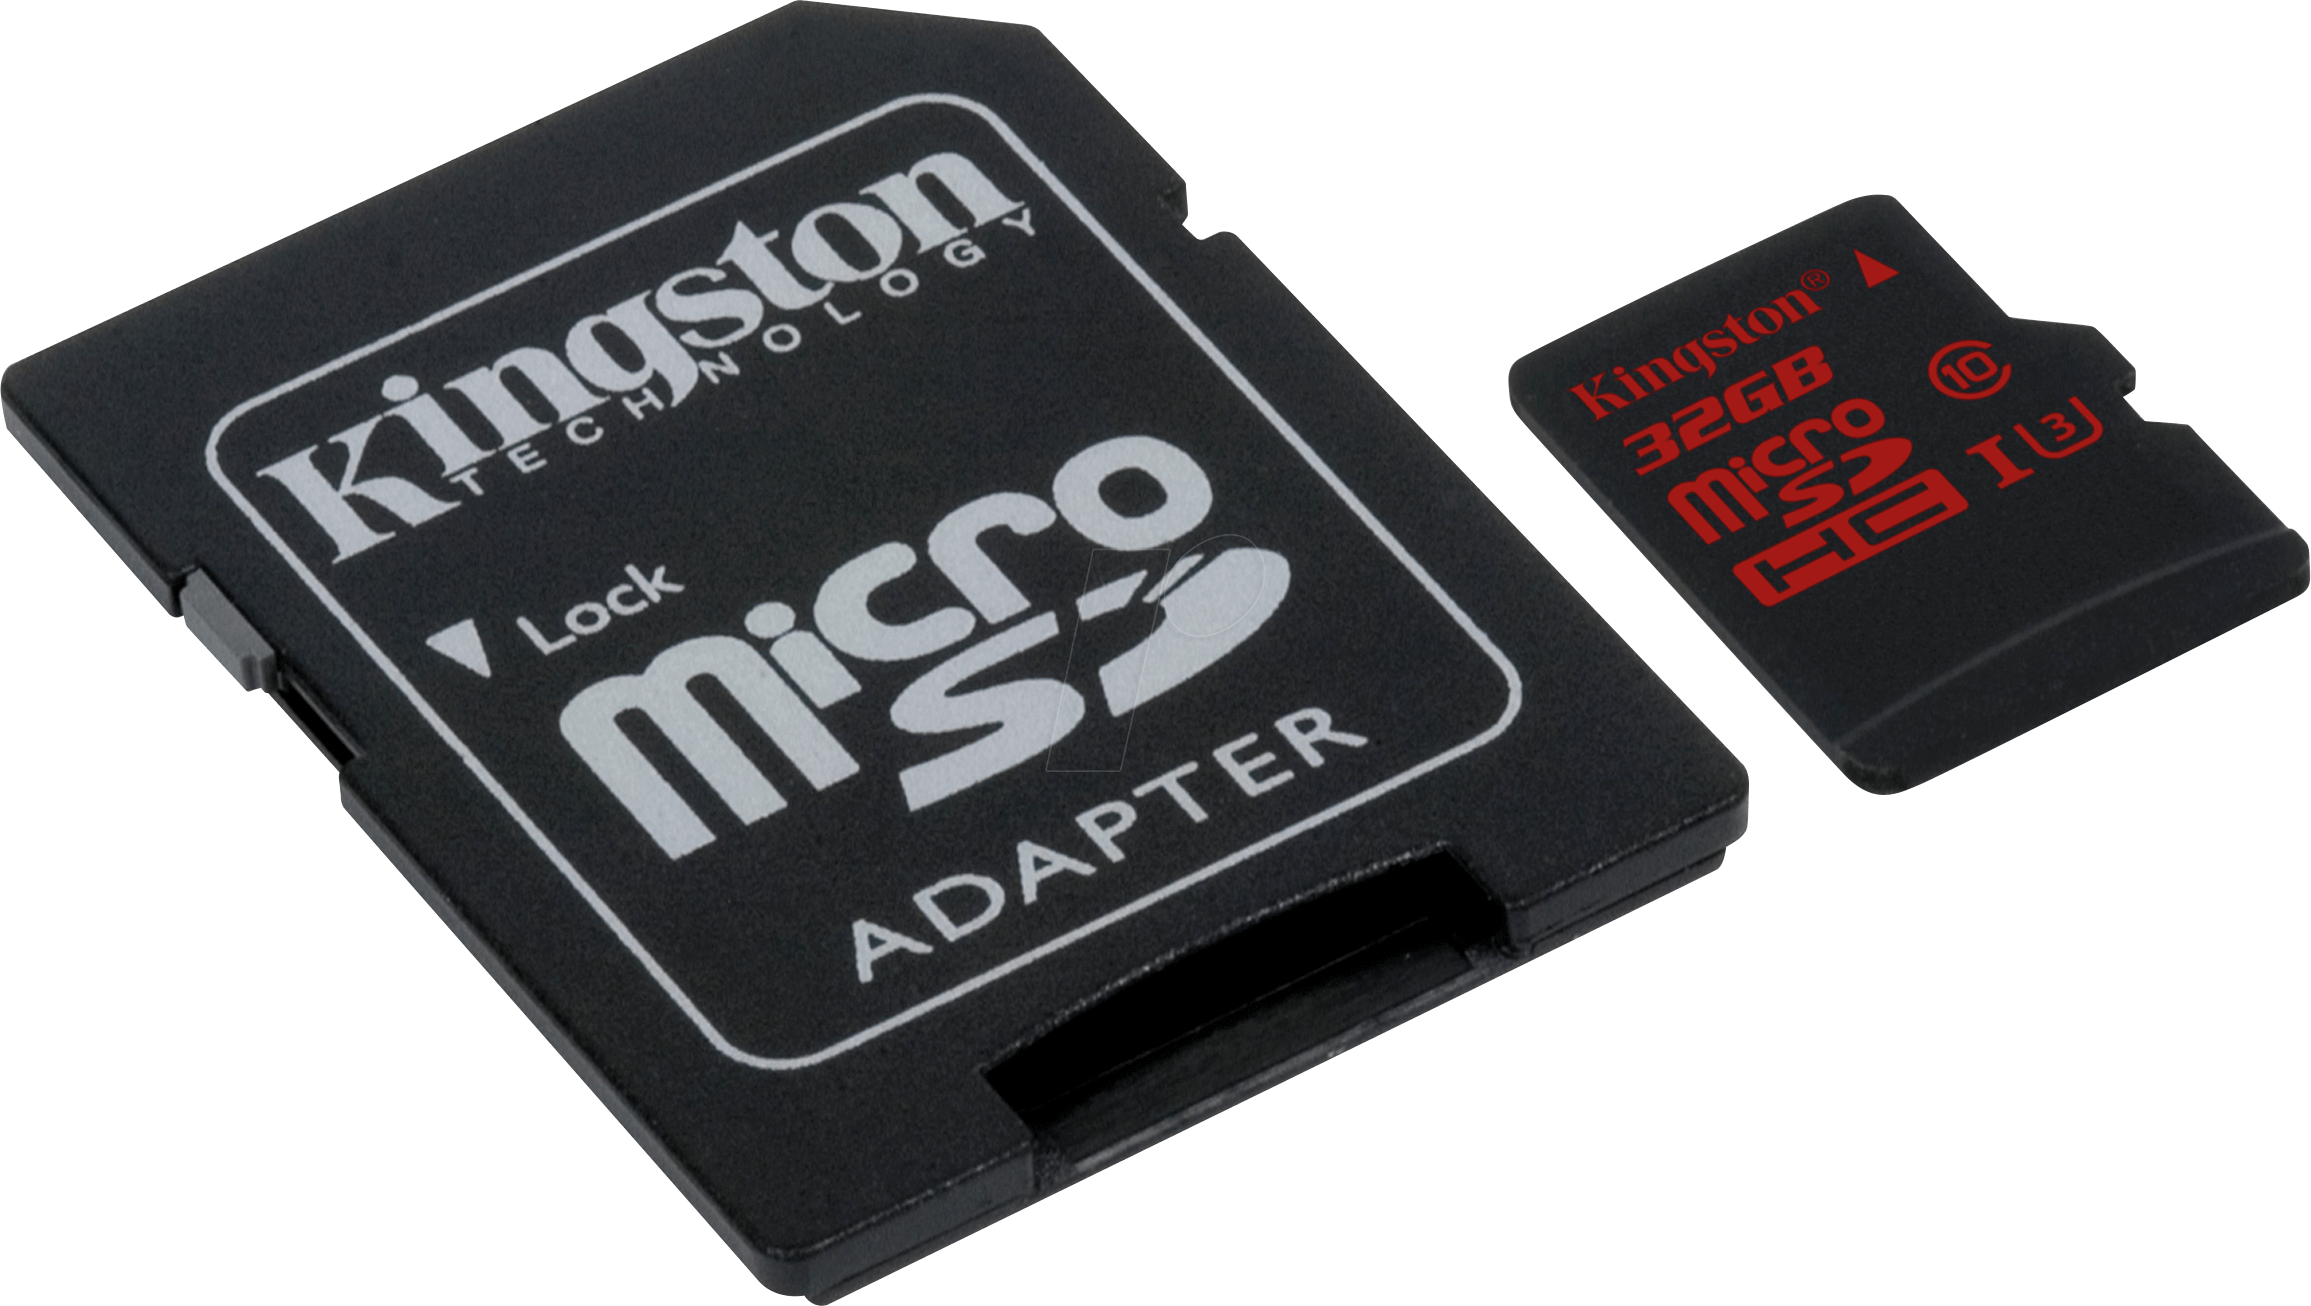 SDCA3/32GB - MicroSDHC-Speicherkarte 32GB - Kingston Class U3